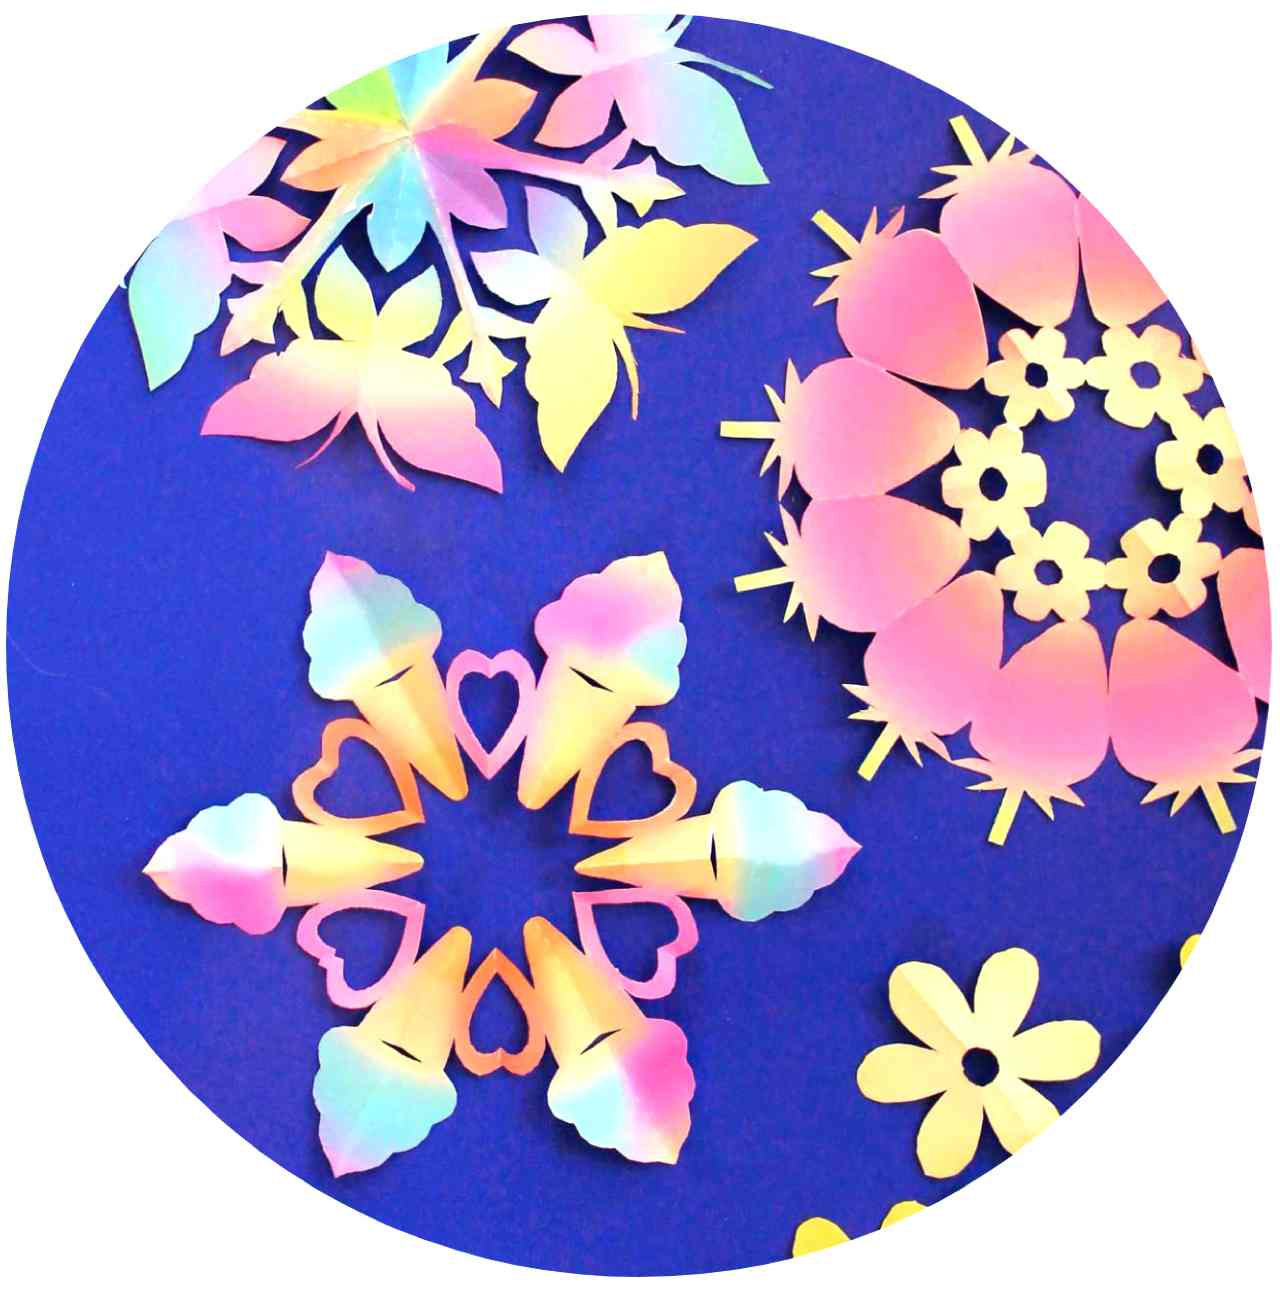 Make colorful paper snowflakes